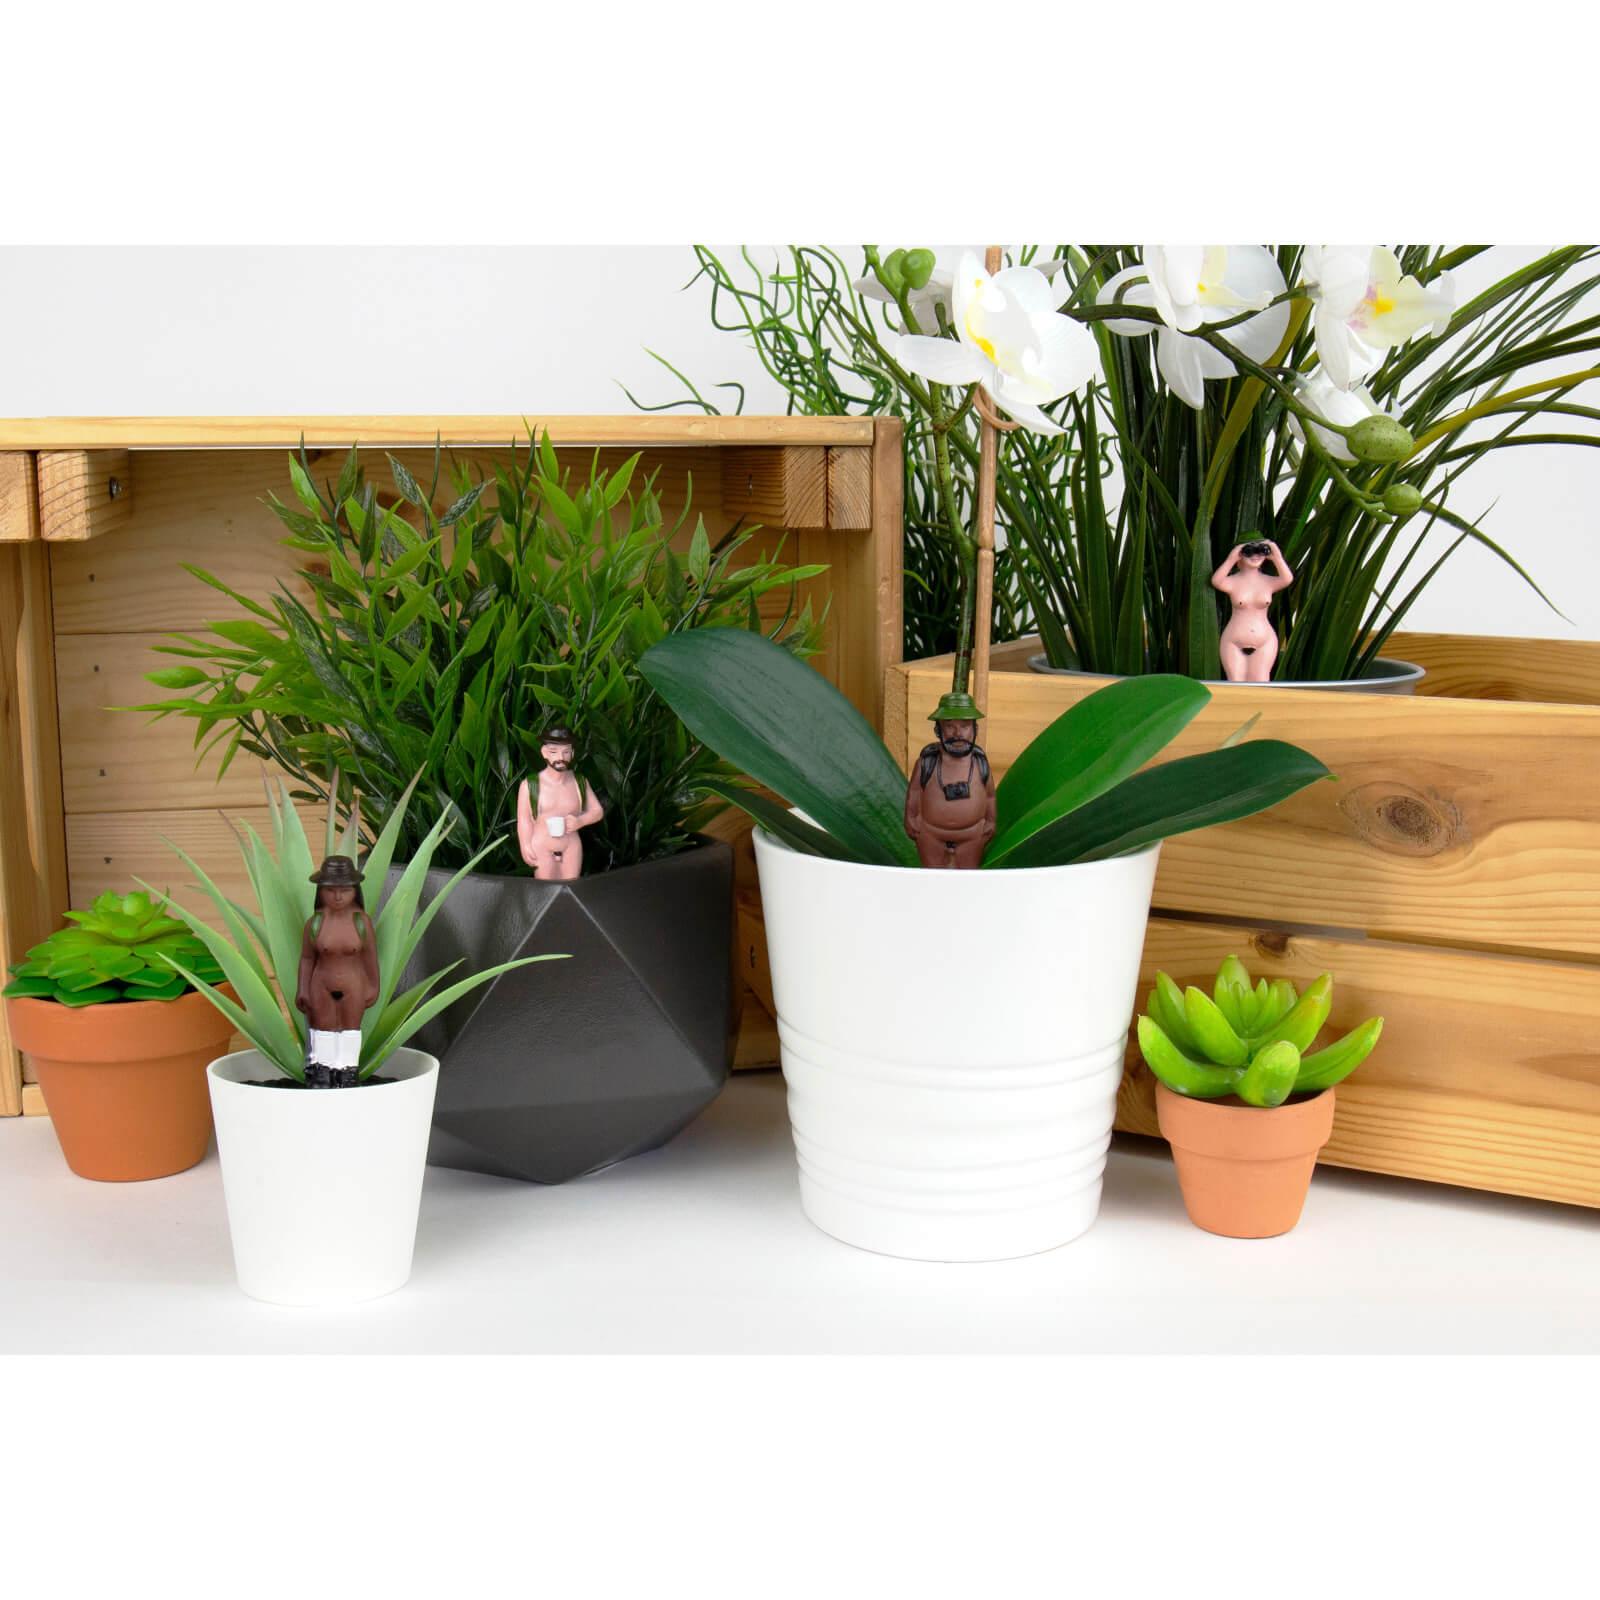 Image of Naked Ramblers - Mini Plant Pot Planters